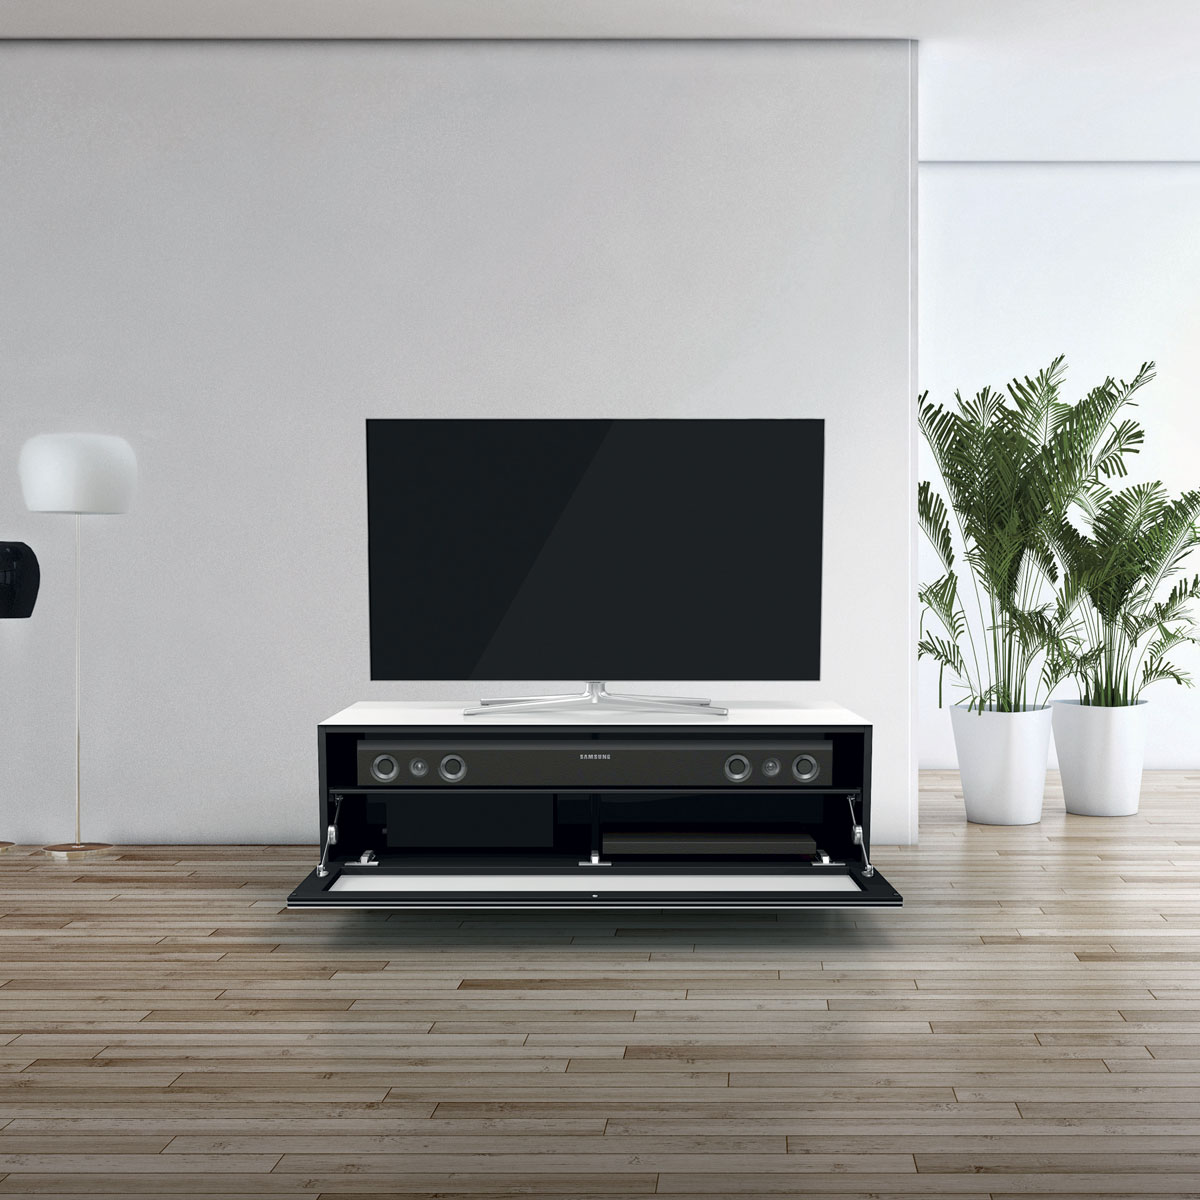 tv m bel fernsehm bel m bel f r lcd tv plasma m bel bei hifi tv seite 3. Black Bedroom Furniture Sets. Home Design Ideas